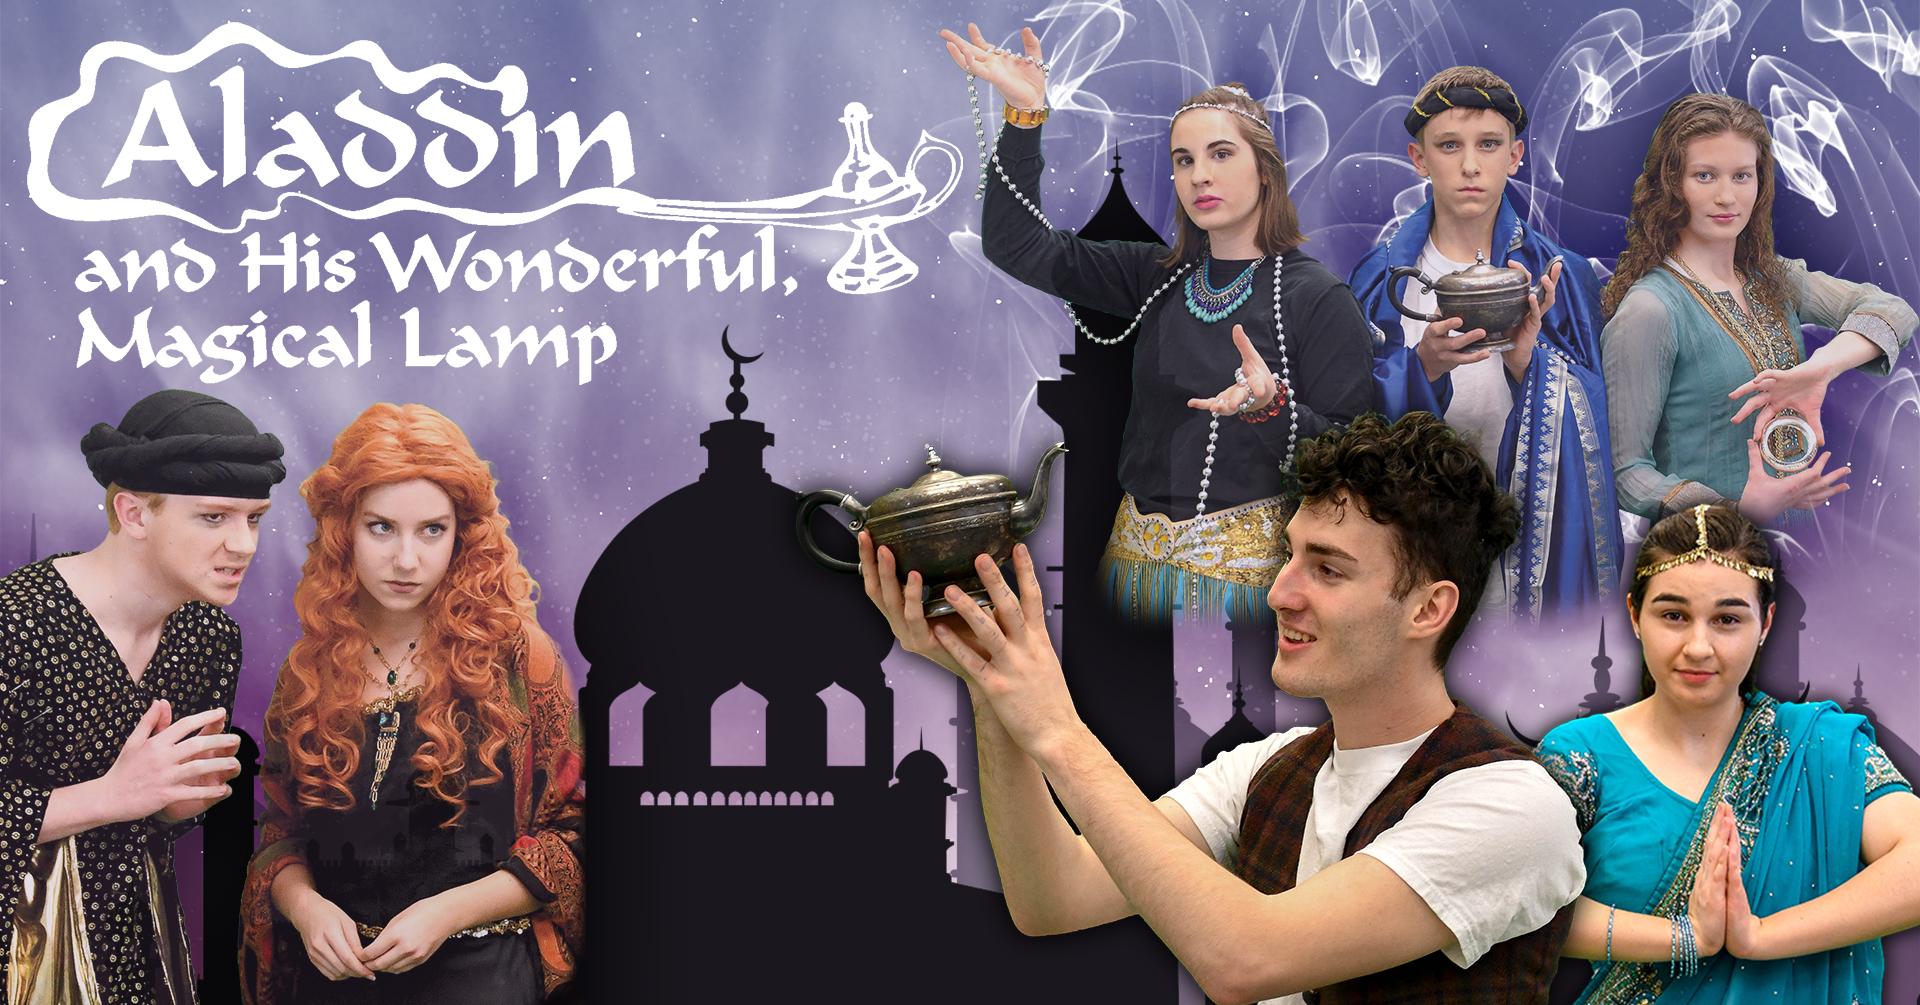 Aladdin and His Wonderful, Magical Lamp